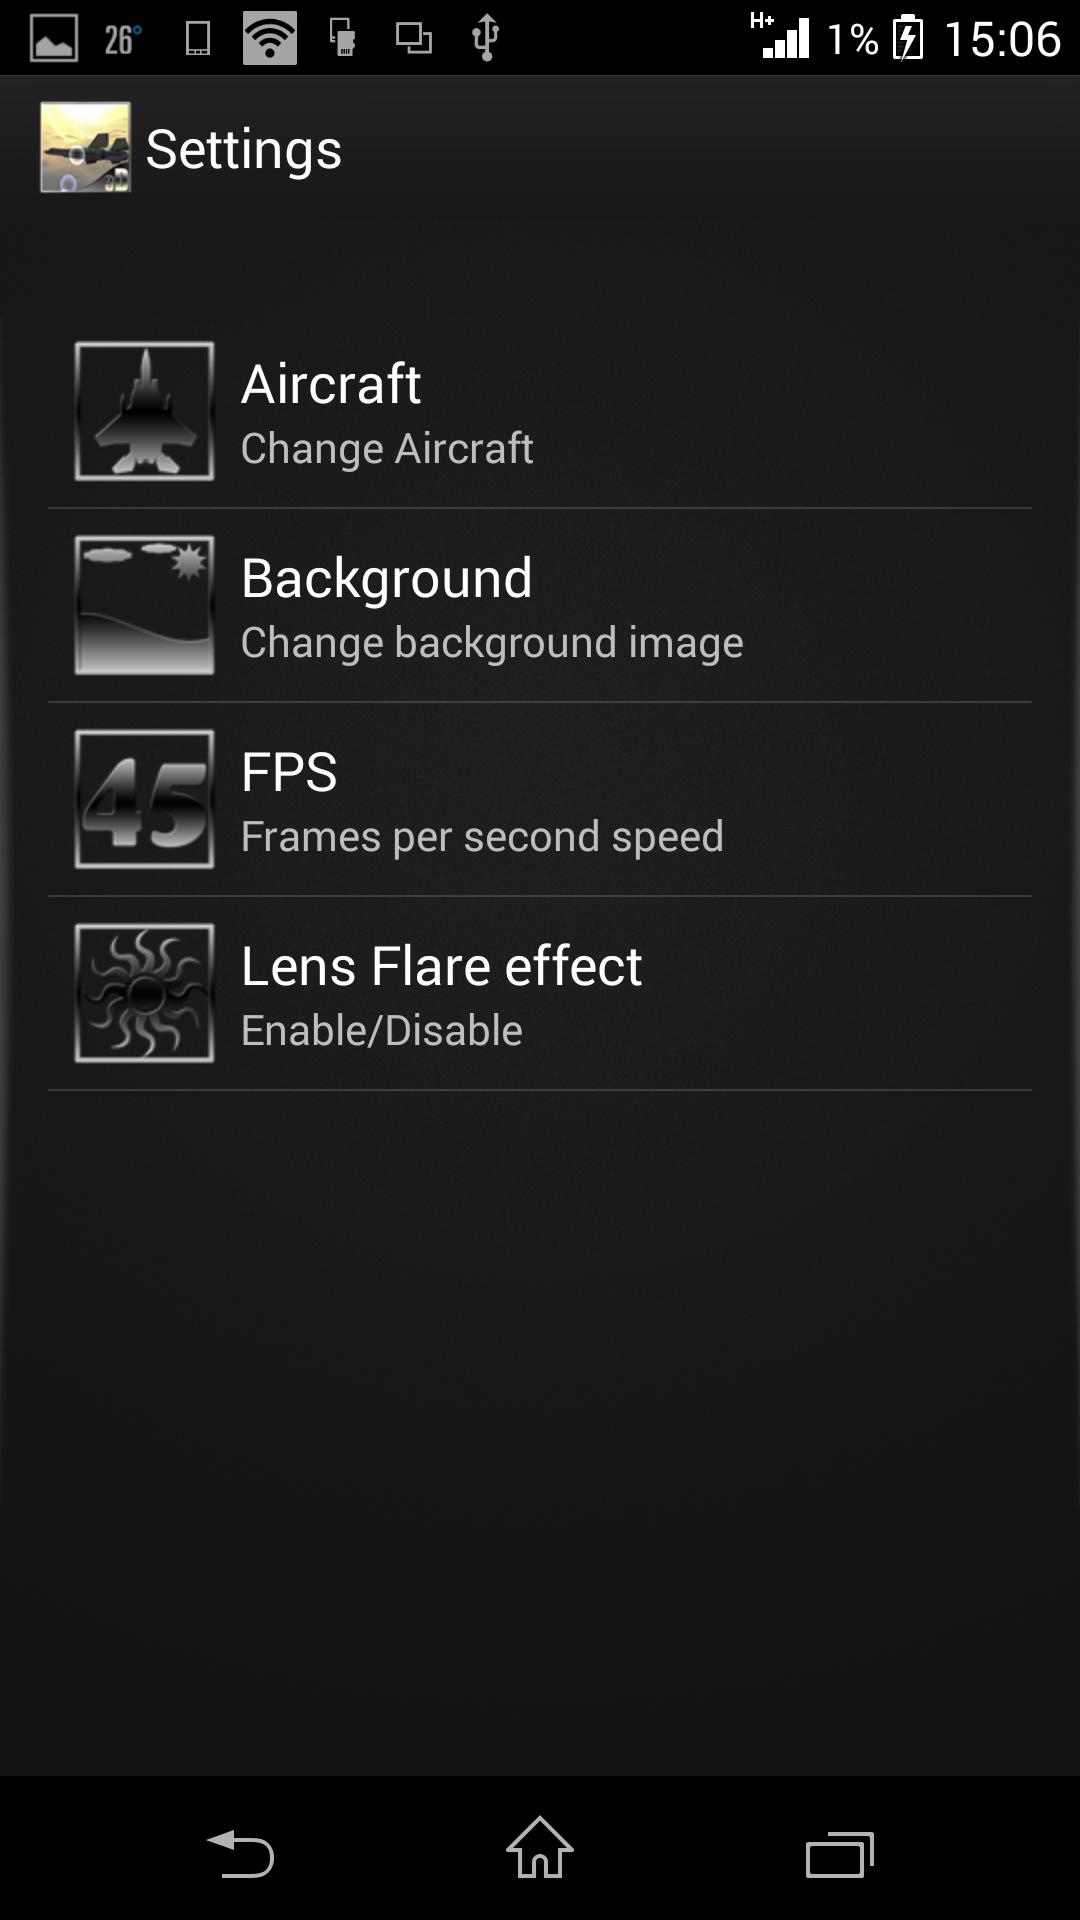 Настройки - Steel Birds 3D LWP для Android